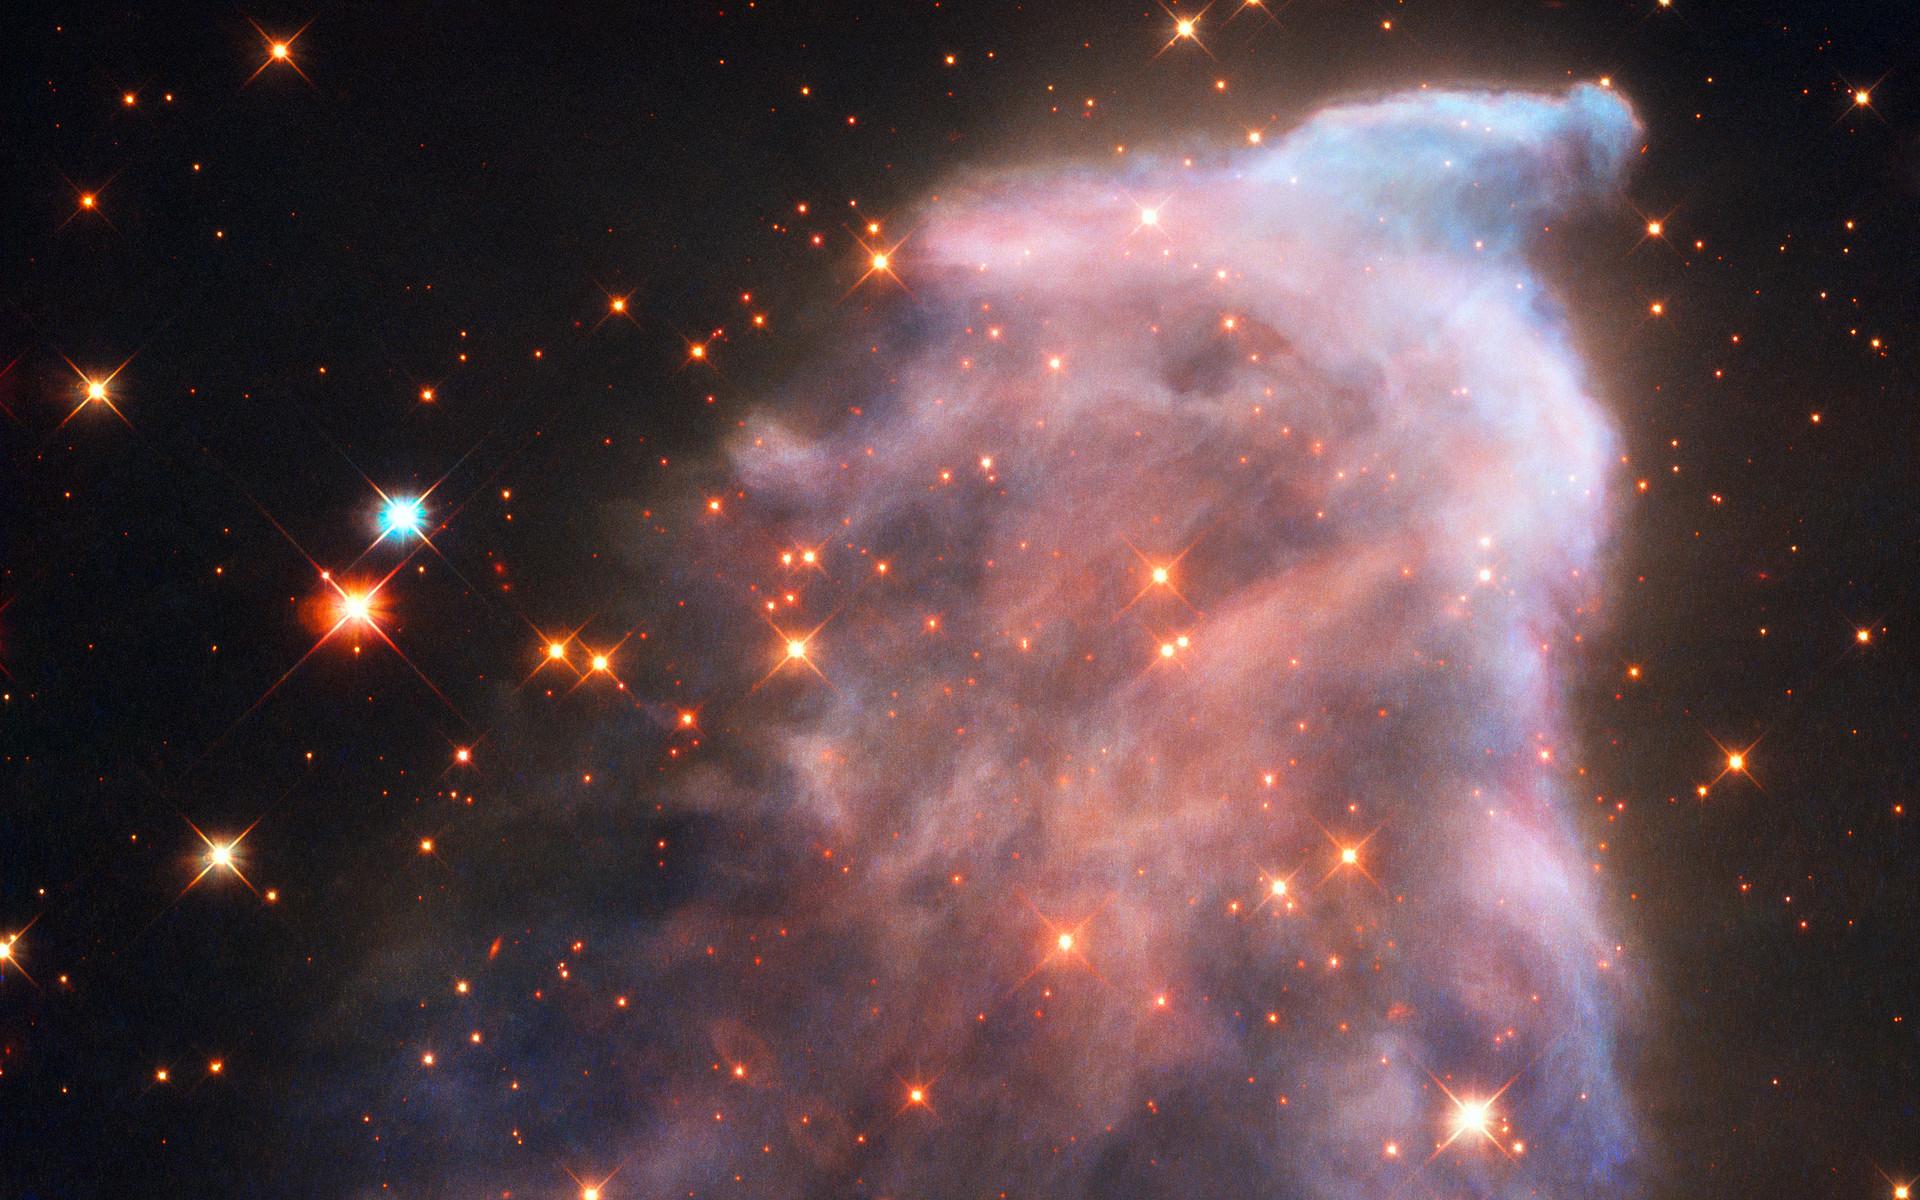 La nébuleuse IC 63